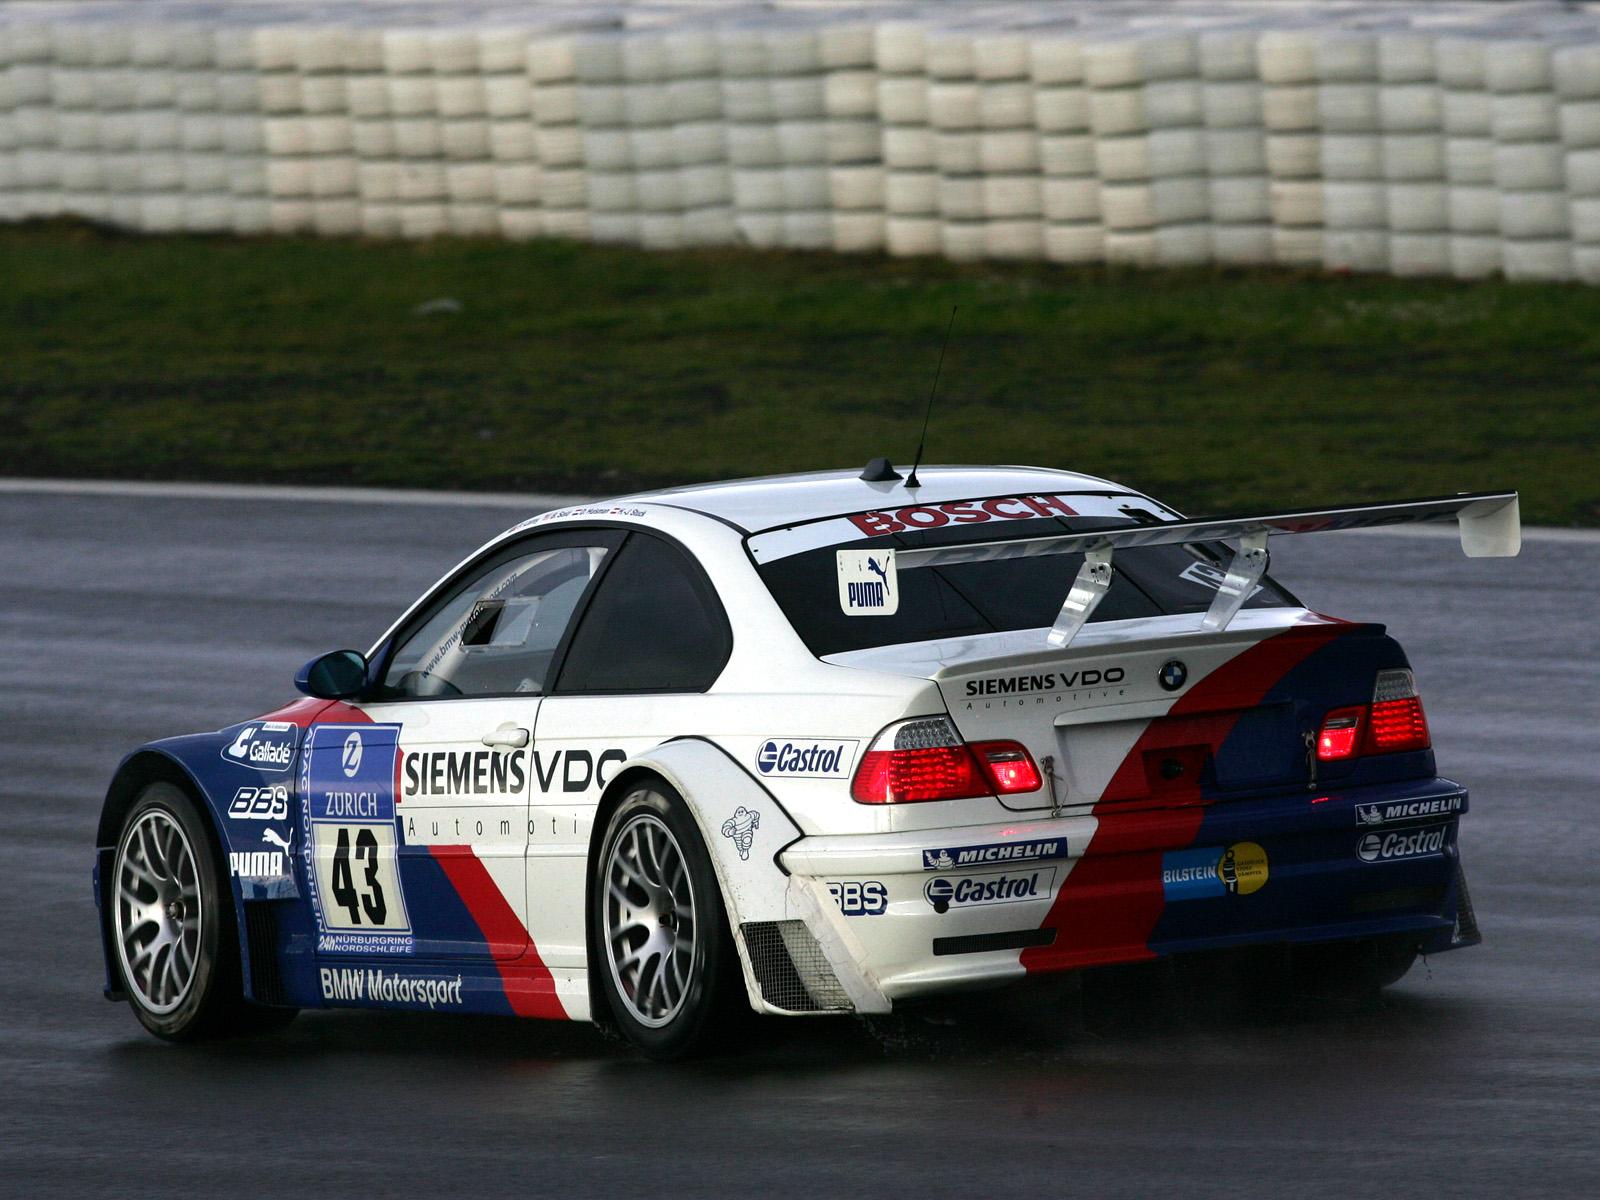 Free Download 2001 Bmw M3 Gtr E46 Race Racing M 3 G Wallpaper